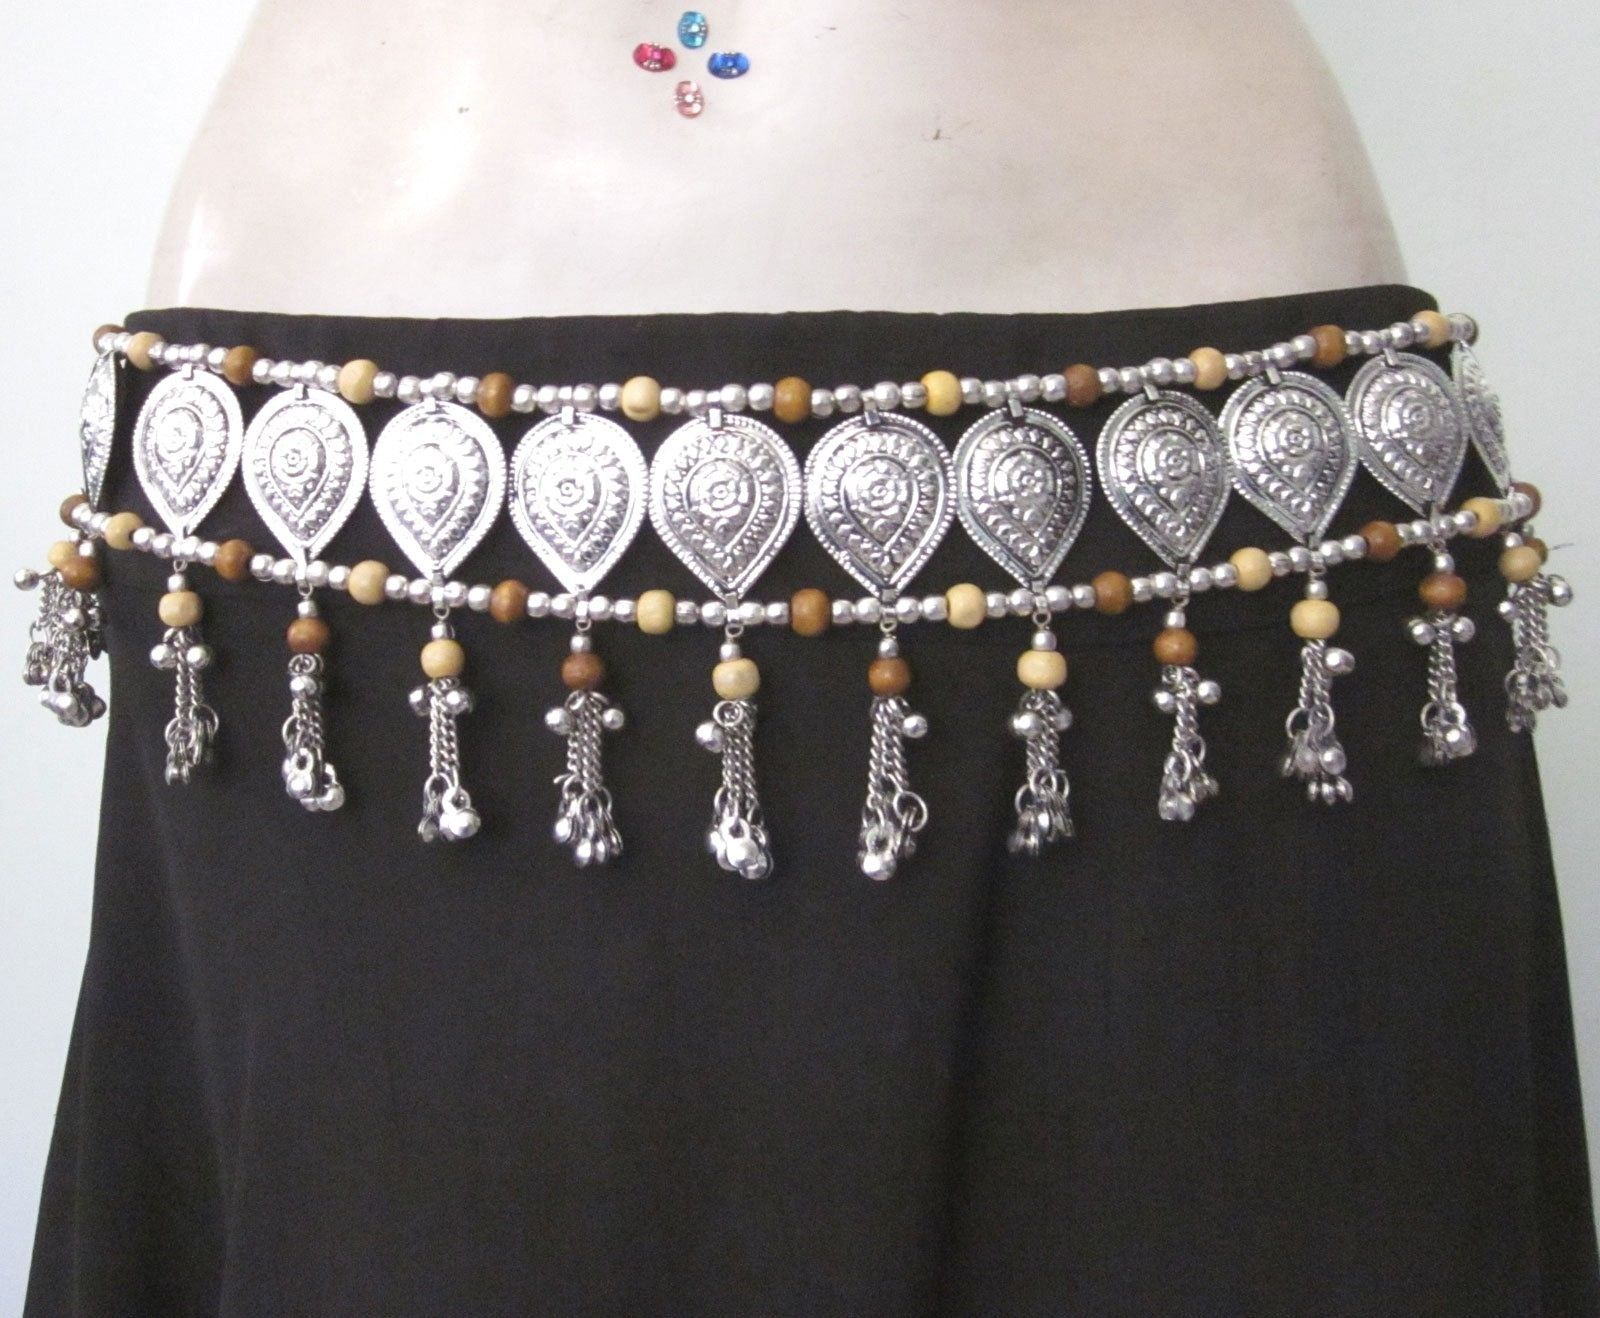 Tie BELT Gypsy Boho Hippie Festival Cosplay Belly Dance Skirt Costume Accessory